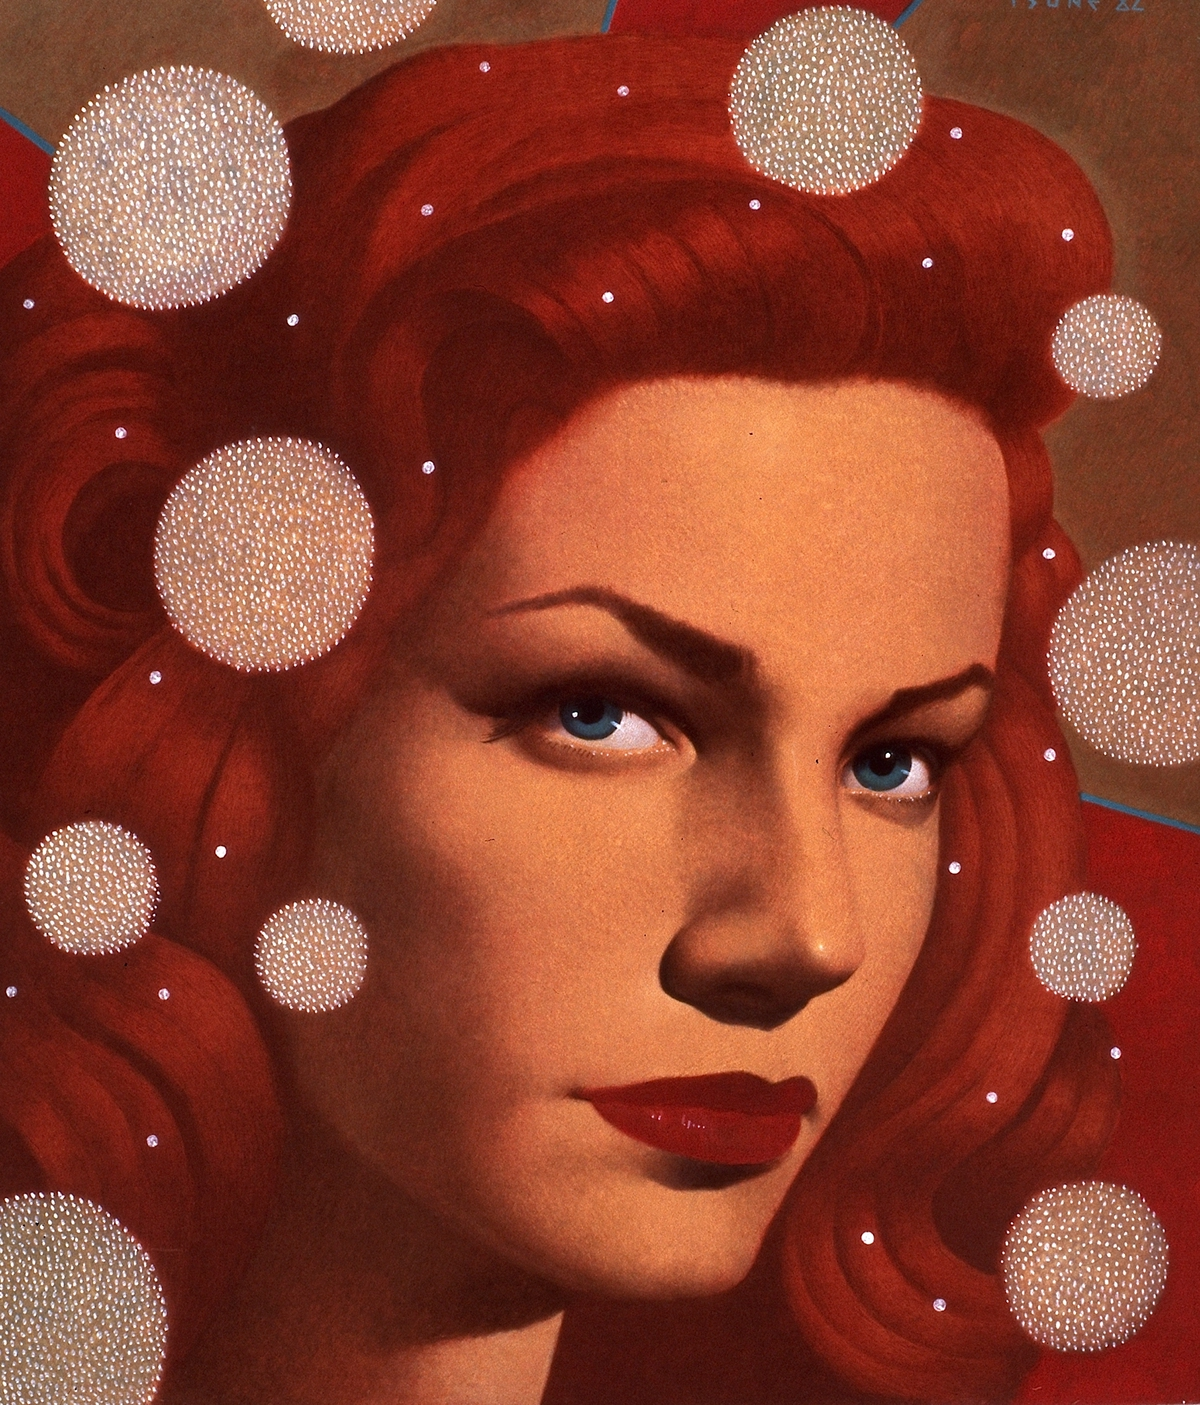 susan hayward,hollywood movie stars,woman portrait